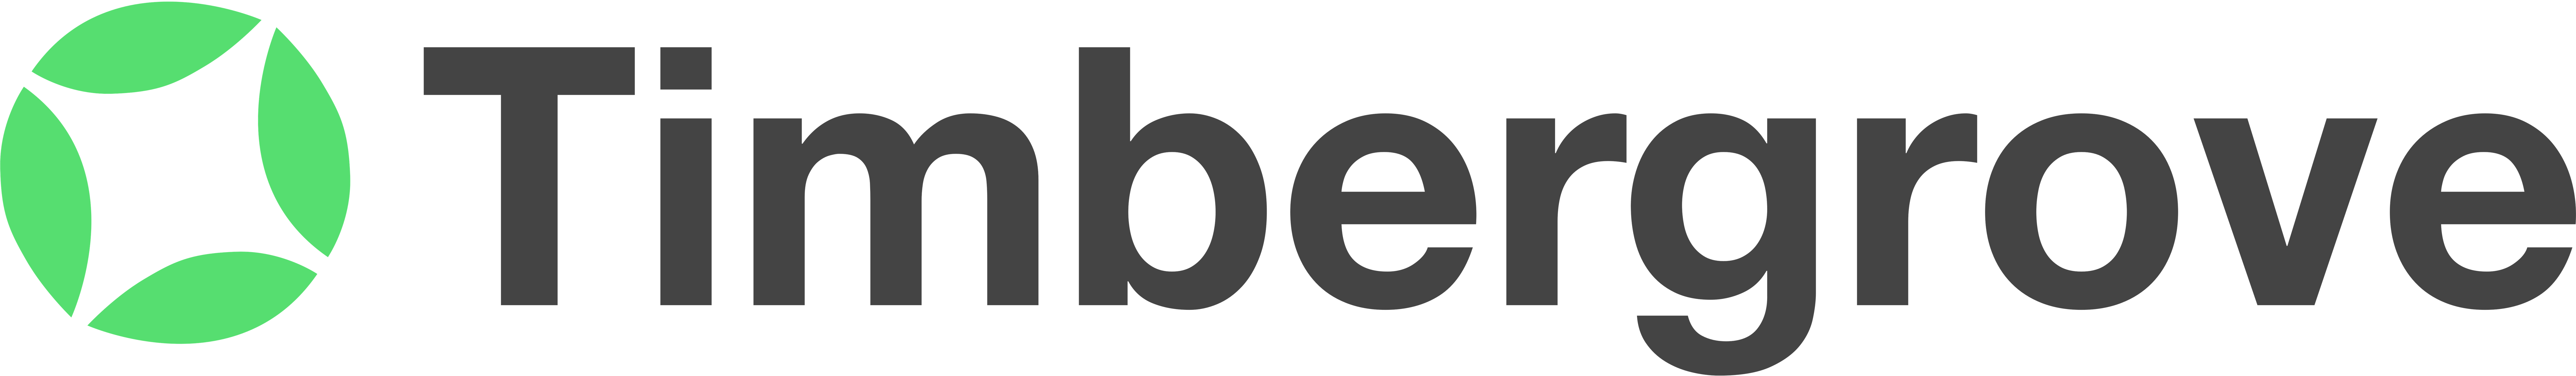 Timbergrove Solutions, LLC Logo